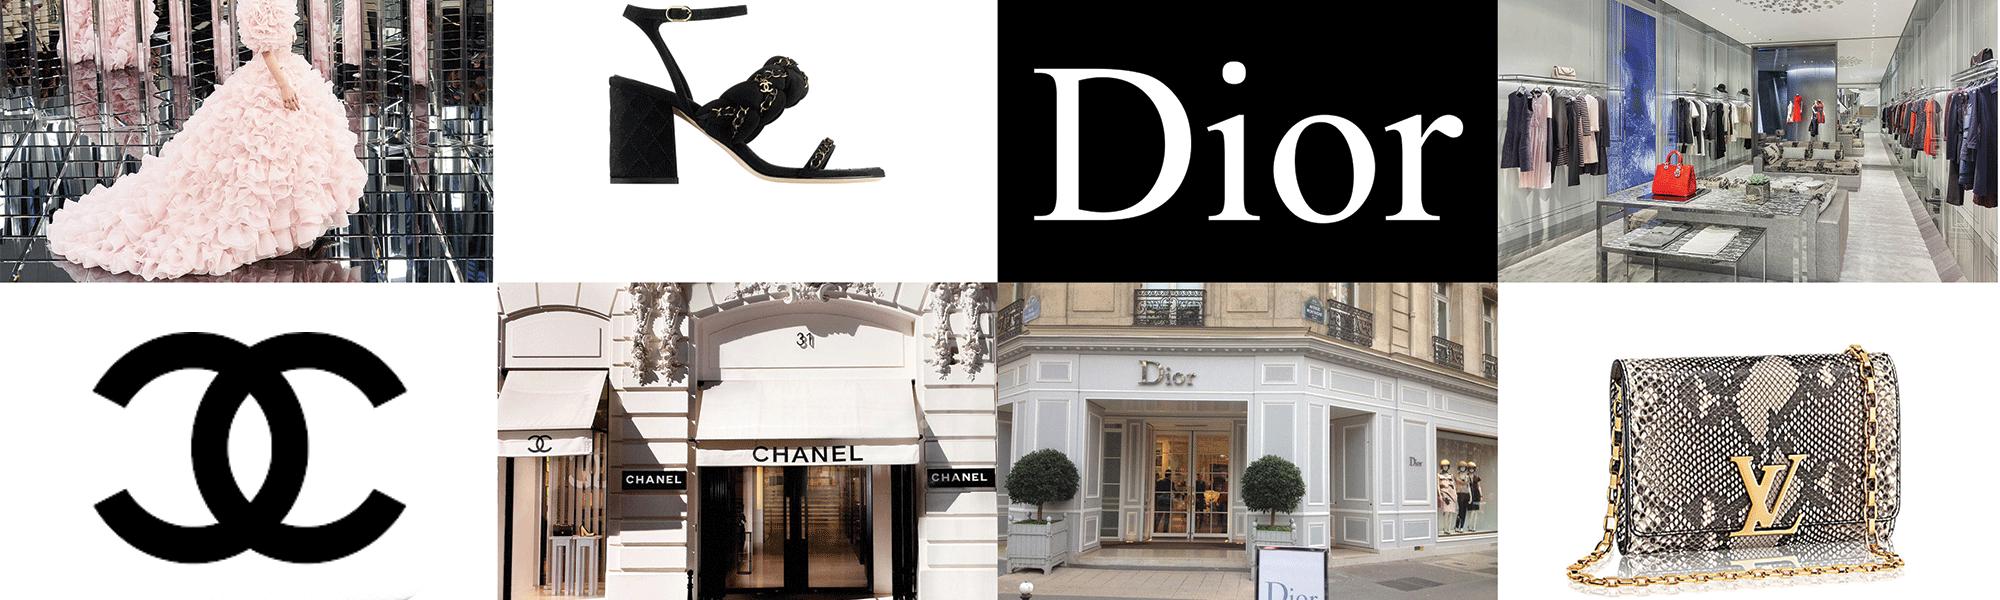 brand luxe paris